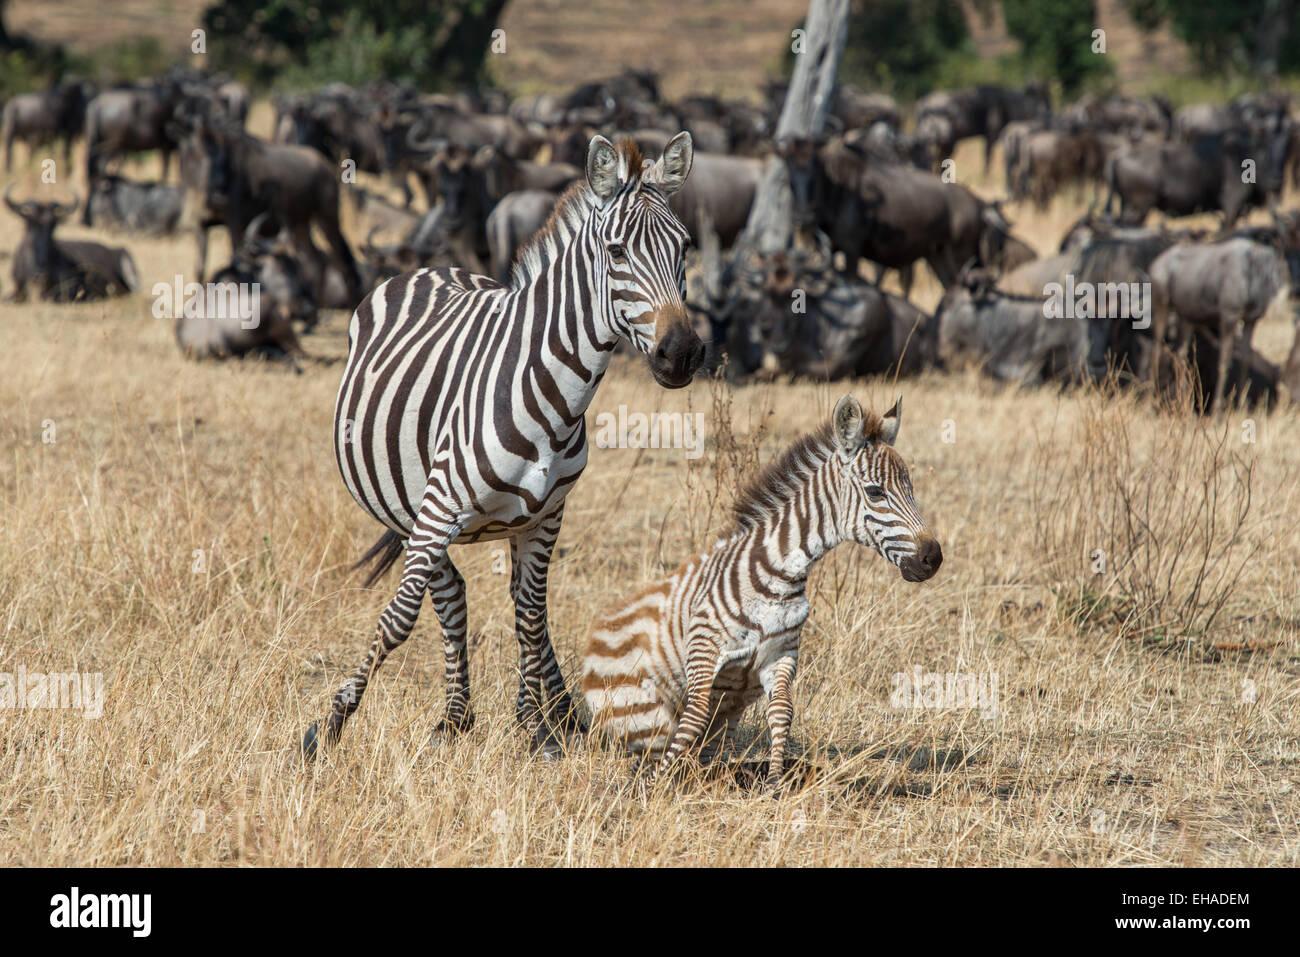 Serengeti NP, Zebras - Stock Image